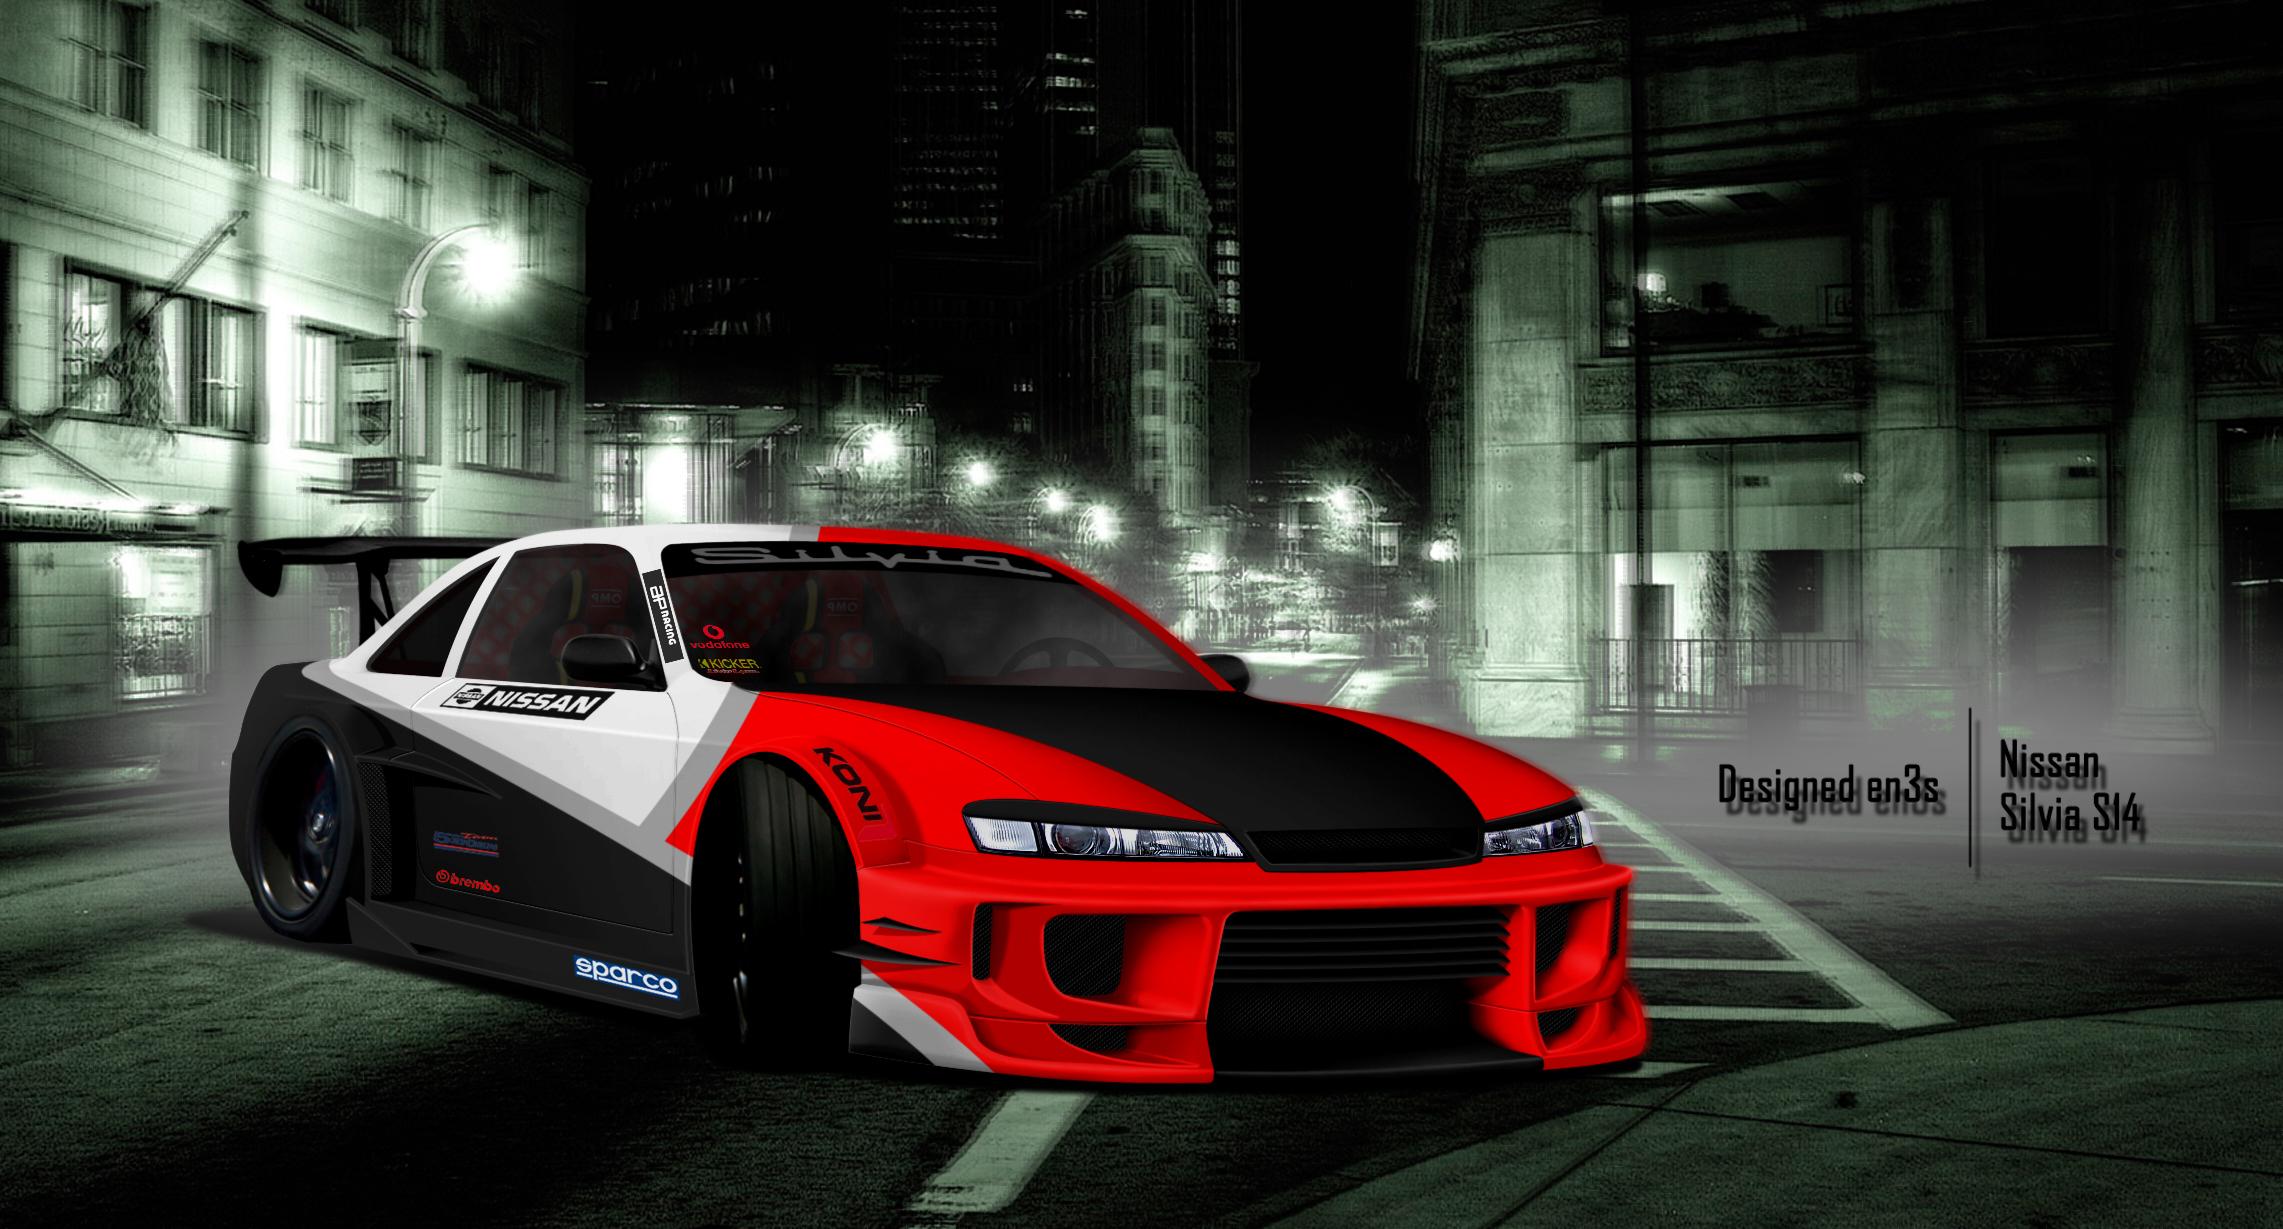 Nissan Silvia S14 by en3sDesign